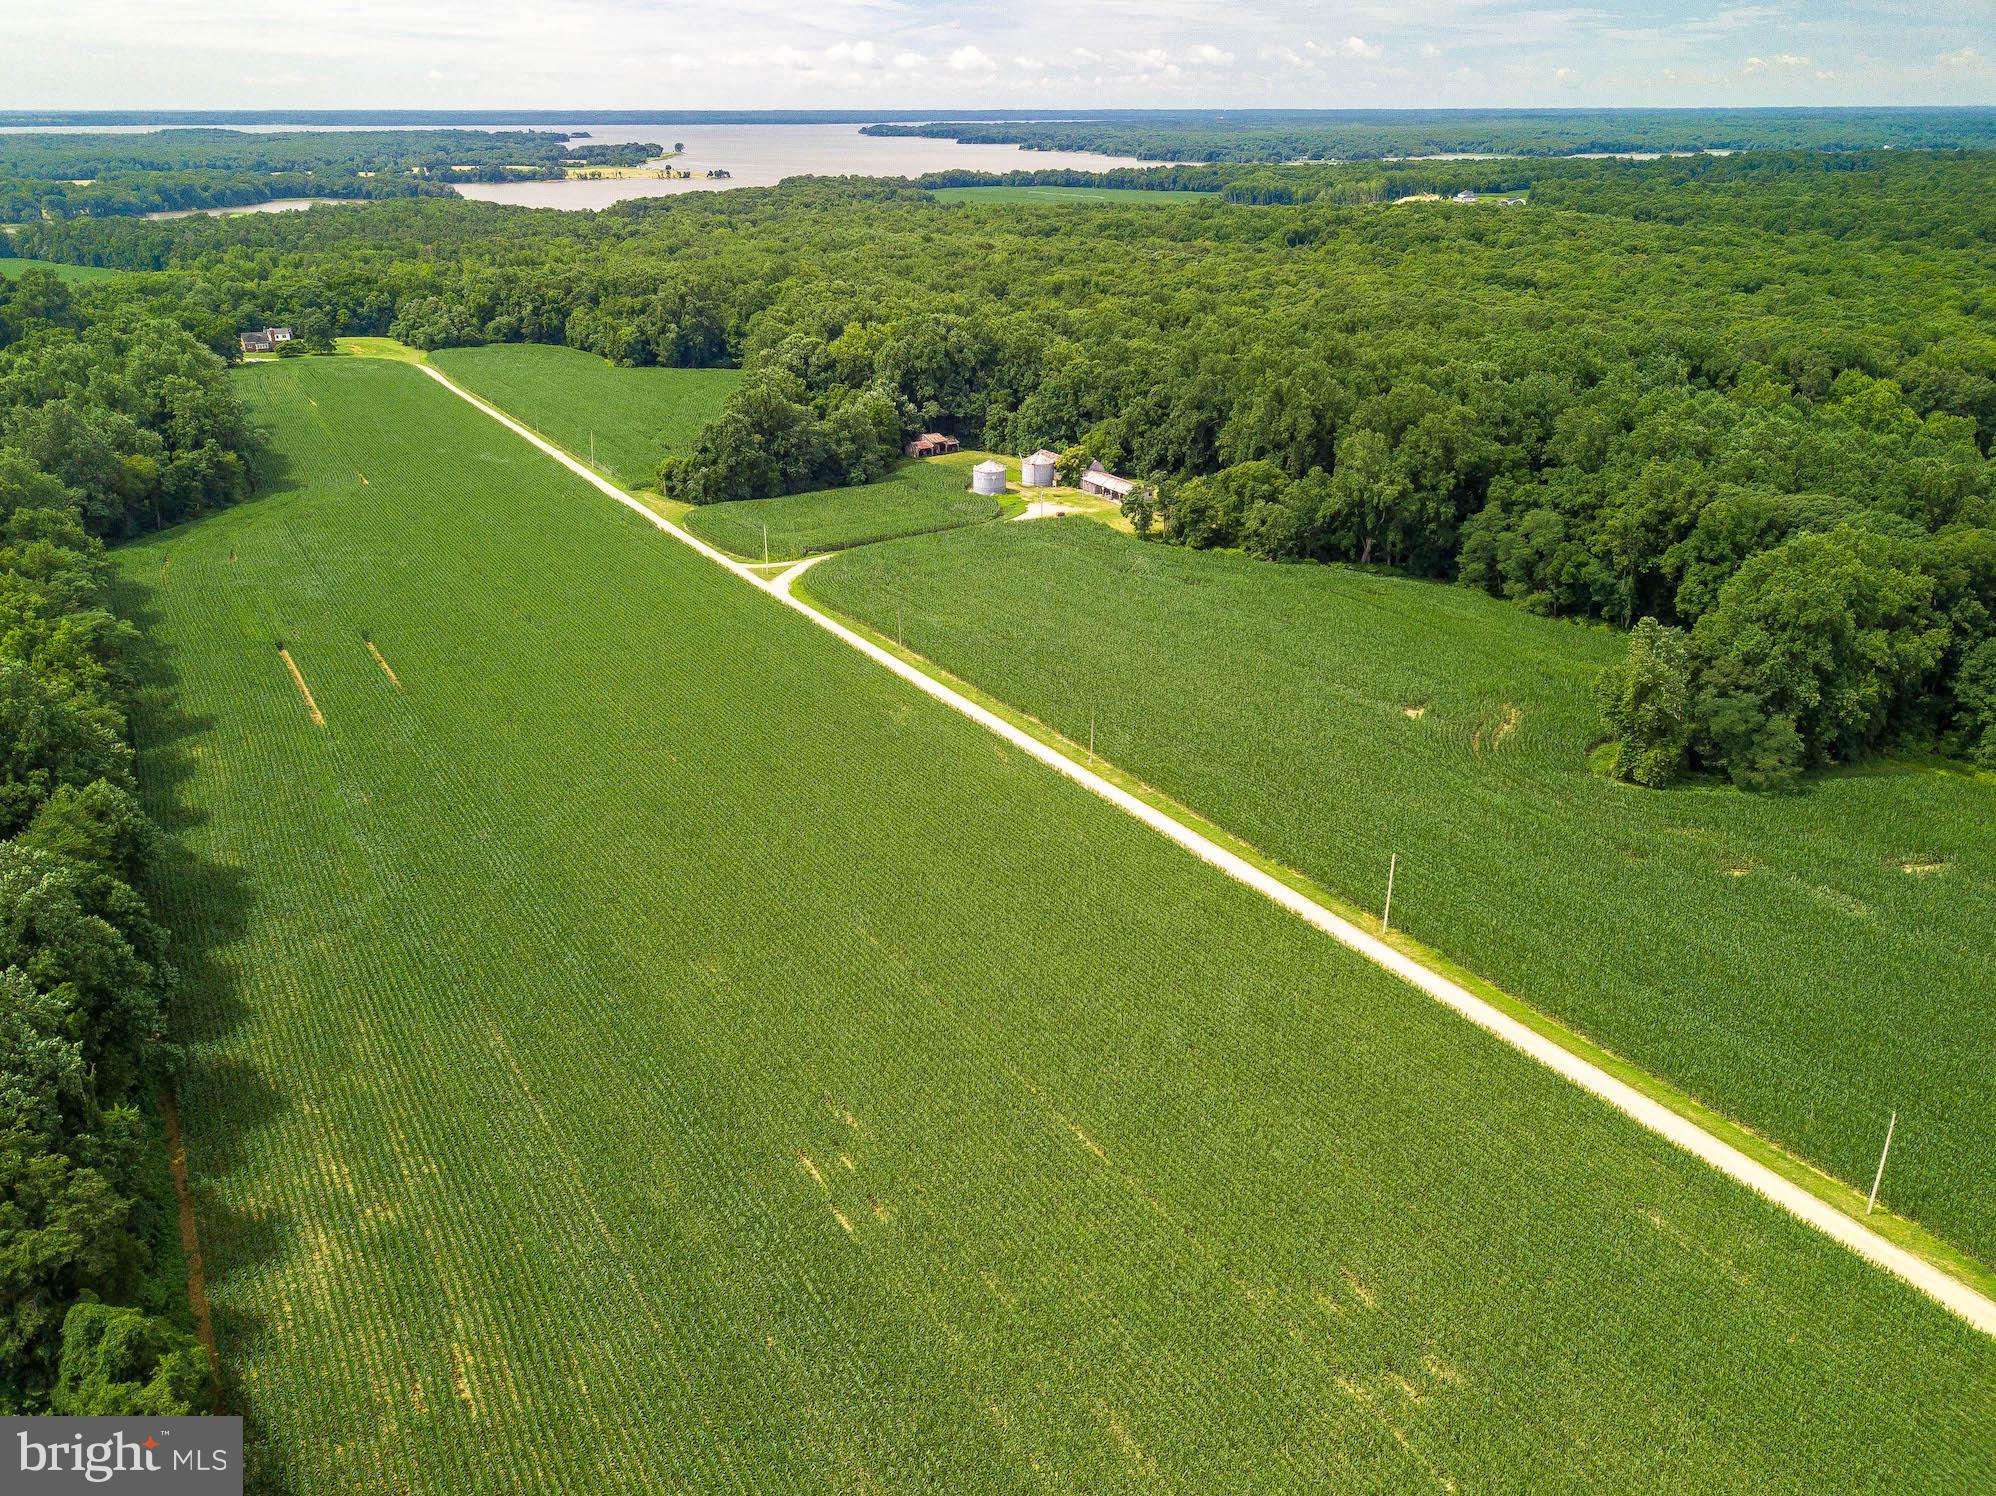 6200 POYNTON MANOR FARM PLACE, WELCOME, MD 20693